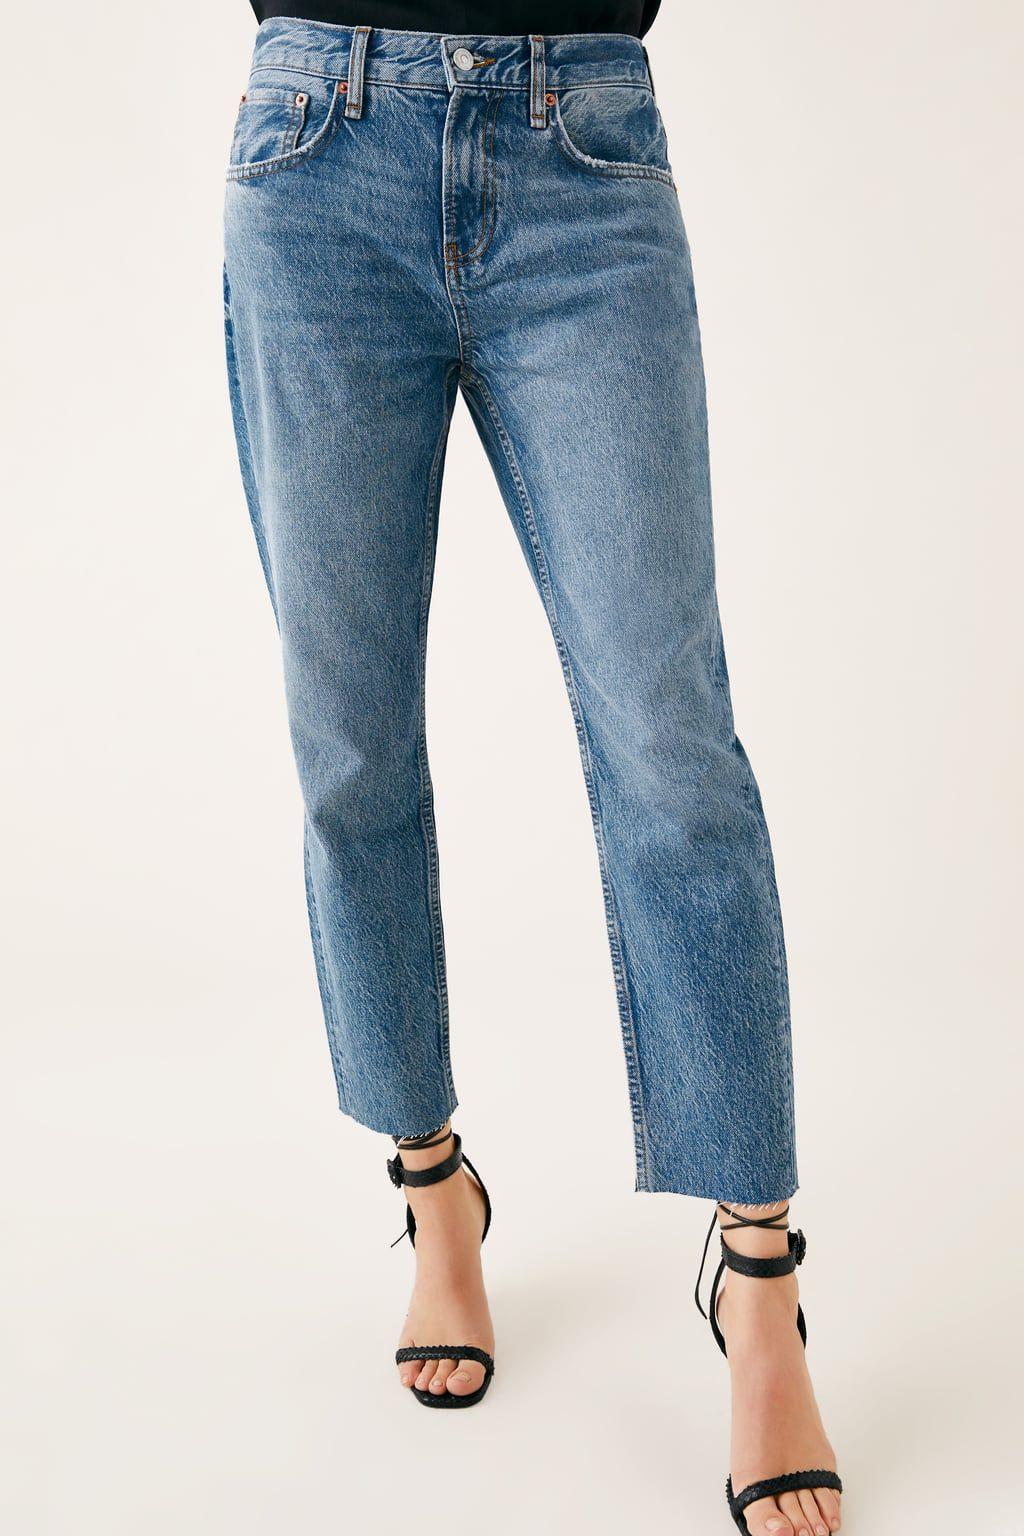 06f2b0c3 Zw premium cigarette jeans in sunset blue in 2019 | Future